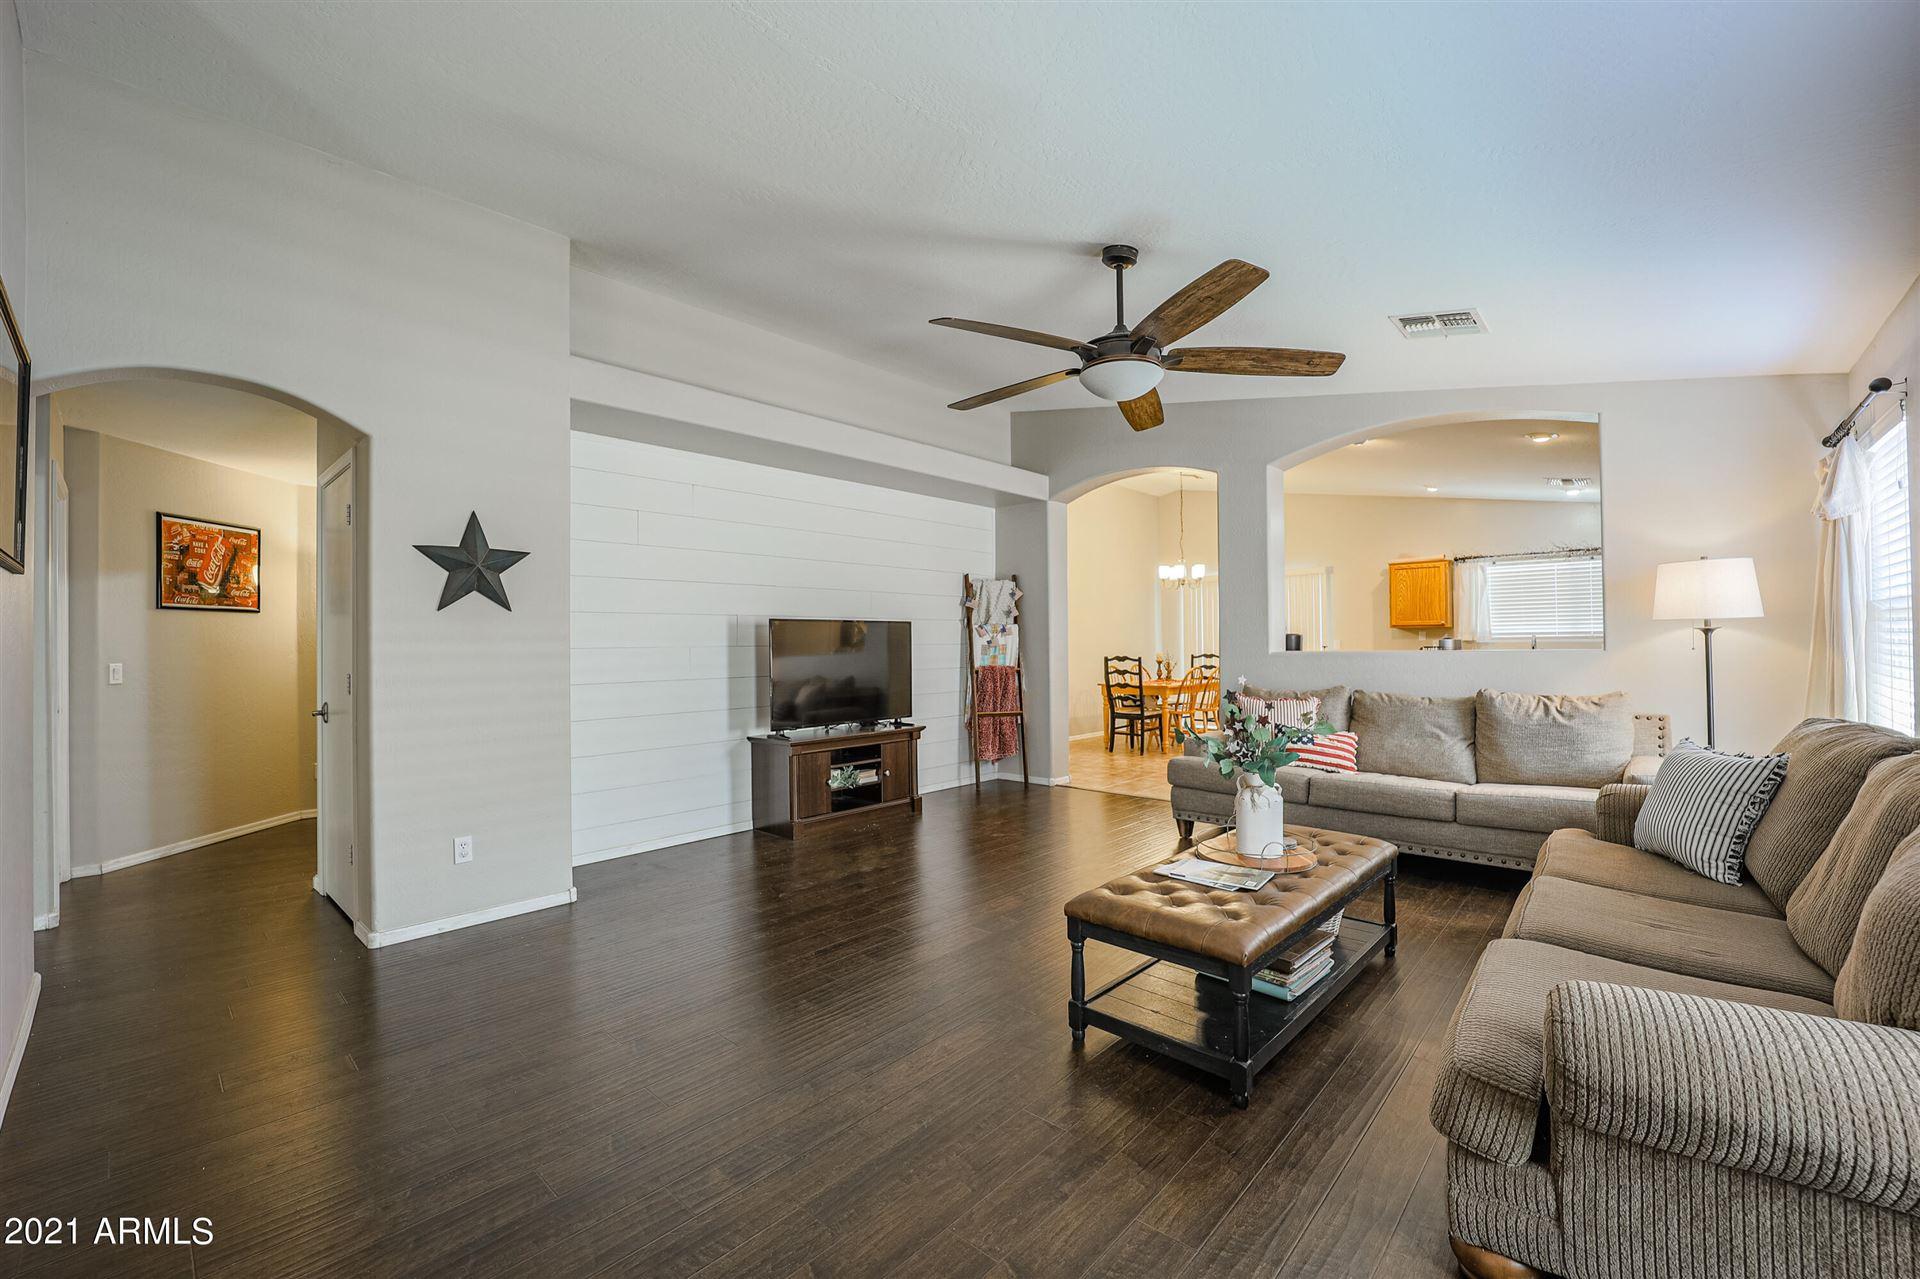 Photo of 15150 W WOODLANDS Avenue, Goodyear, AZ 85338 (MLS # 6249837)